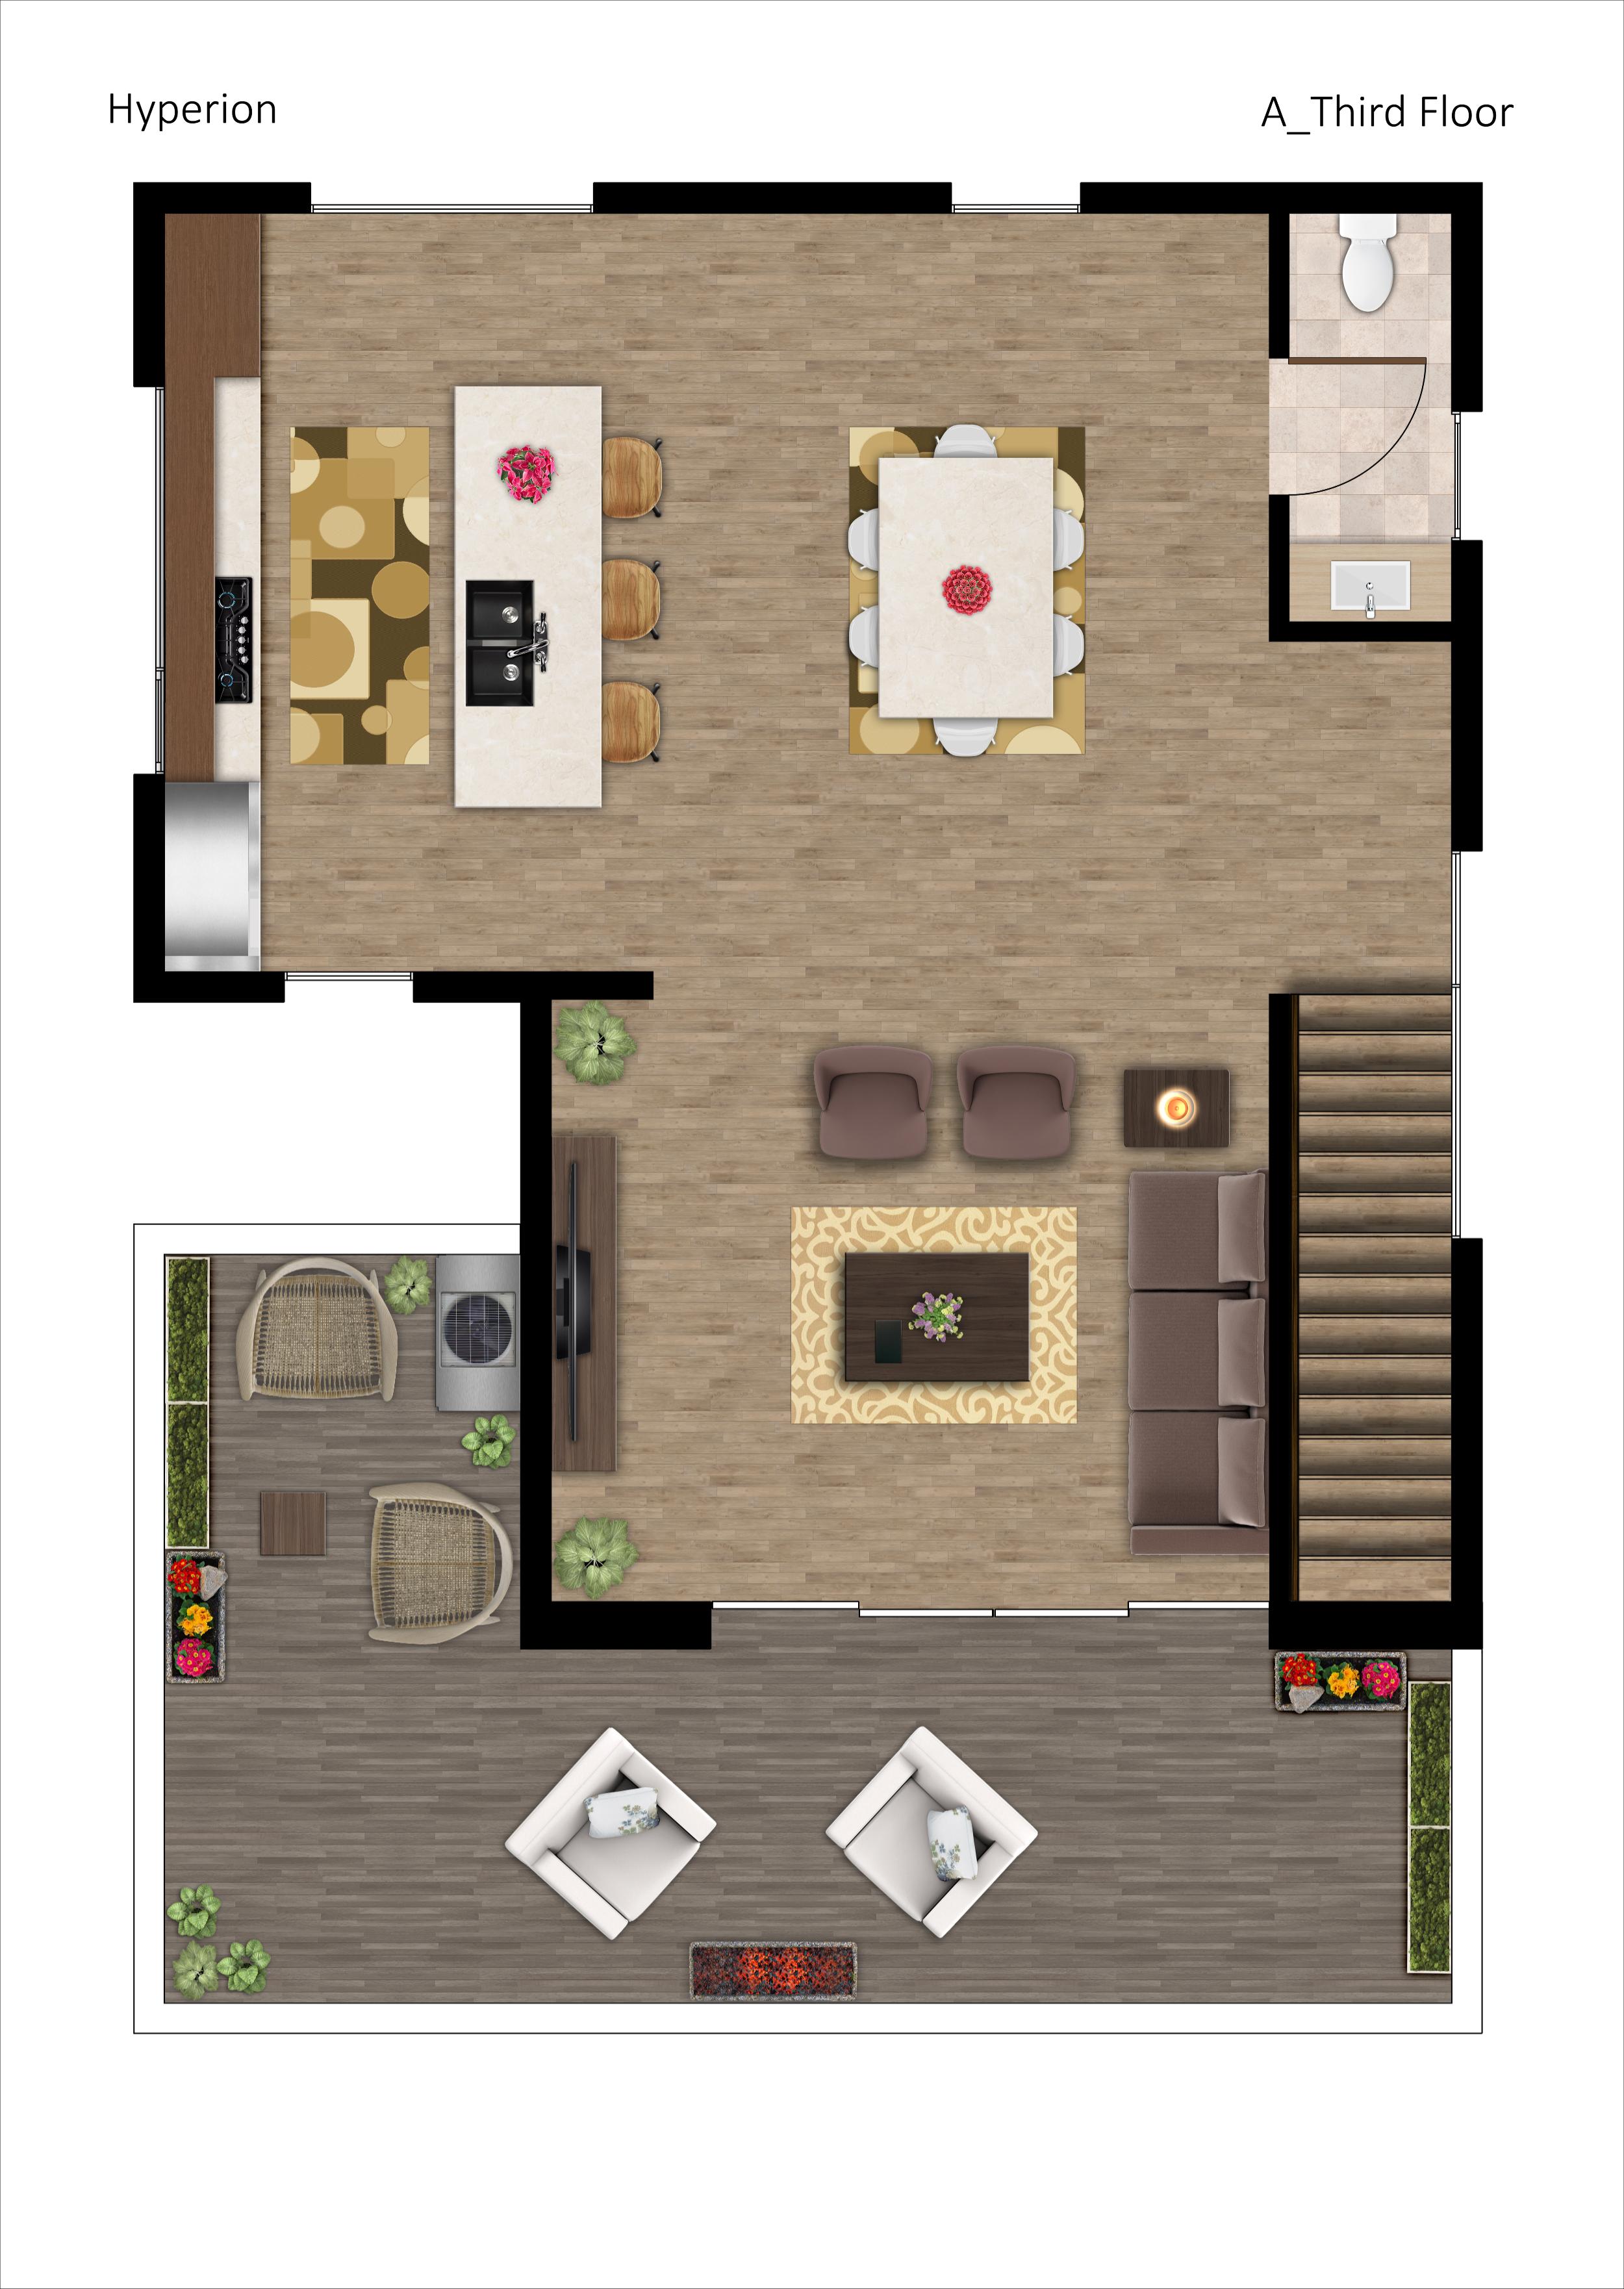 Hyperion_A_Third Floor_FNL.jpg